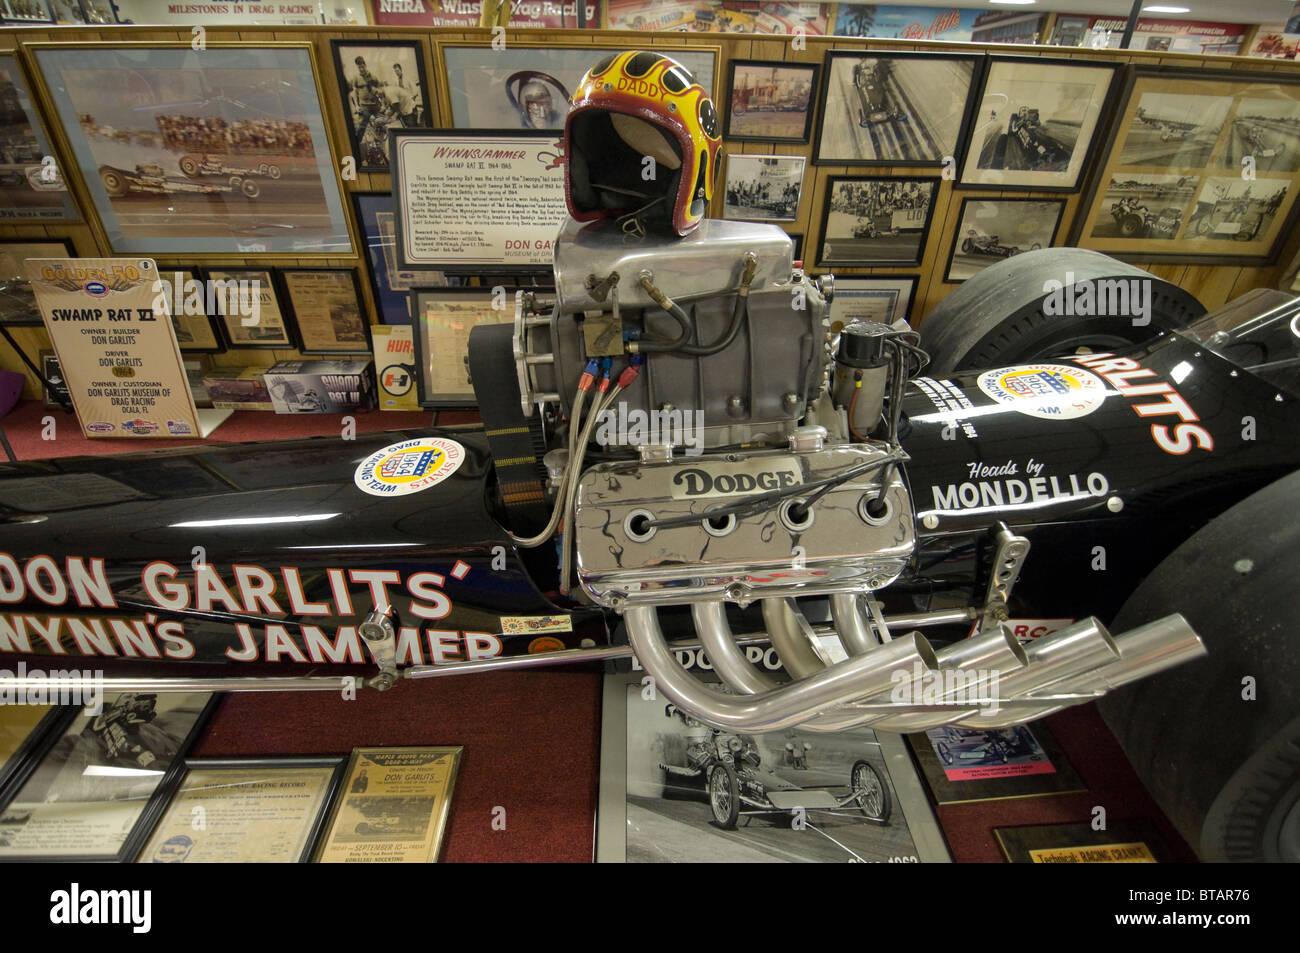 fuel dragster at Don Garlits Museum of Drag Racing Ocala Florida Stock Photo: 32199866 - Alamy